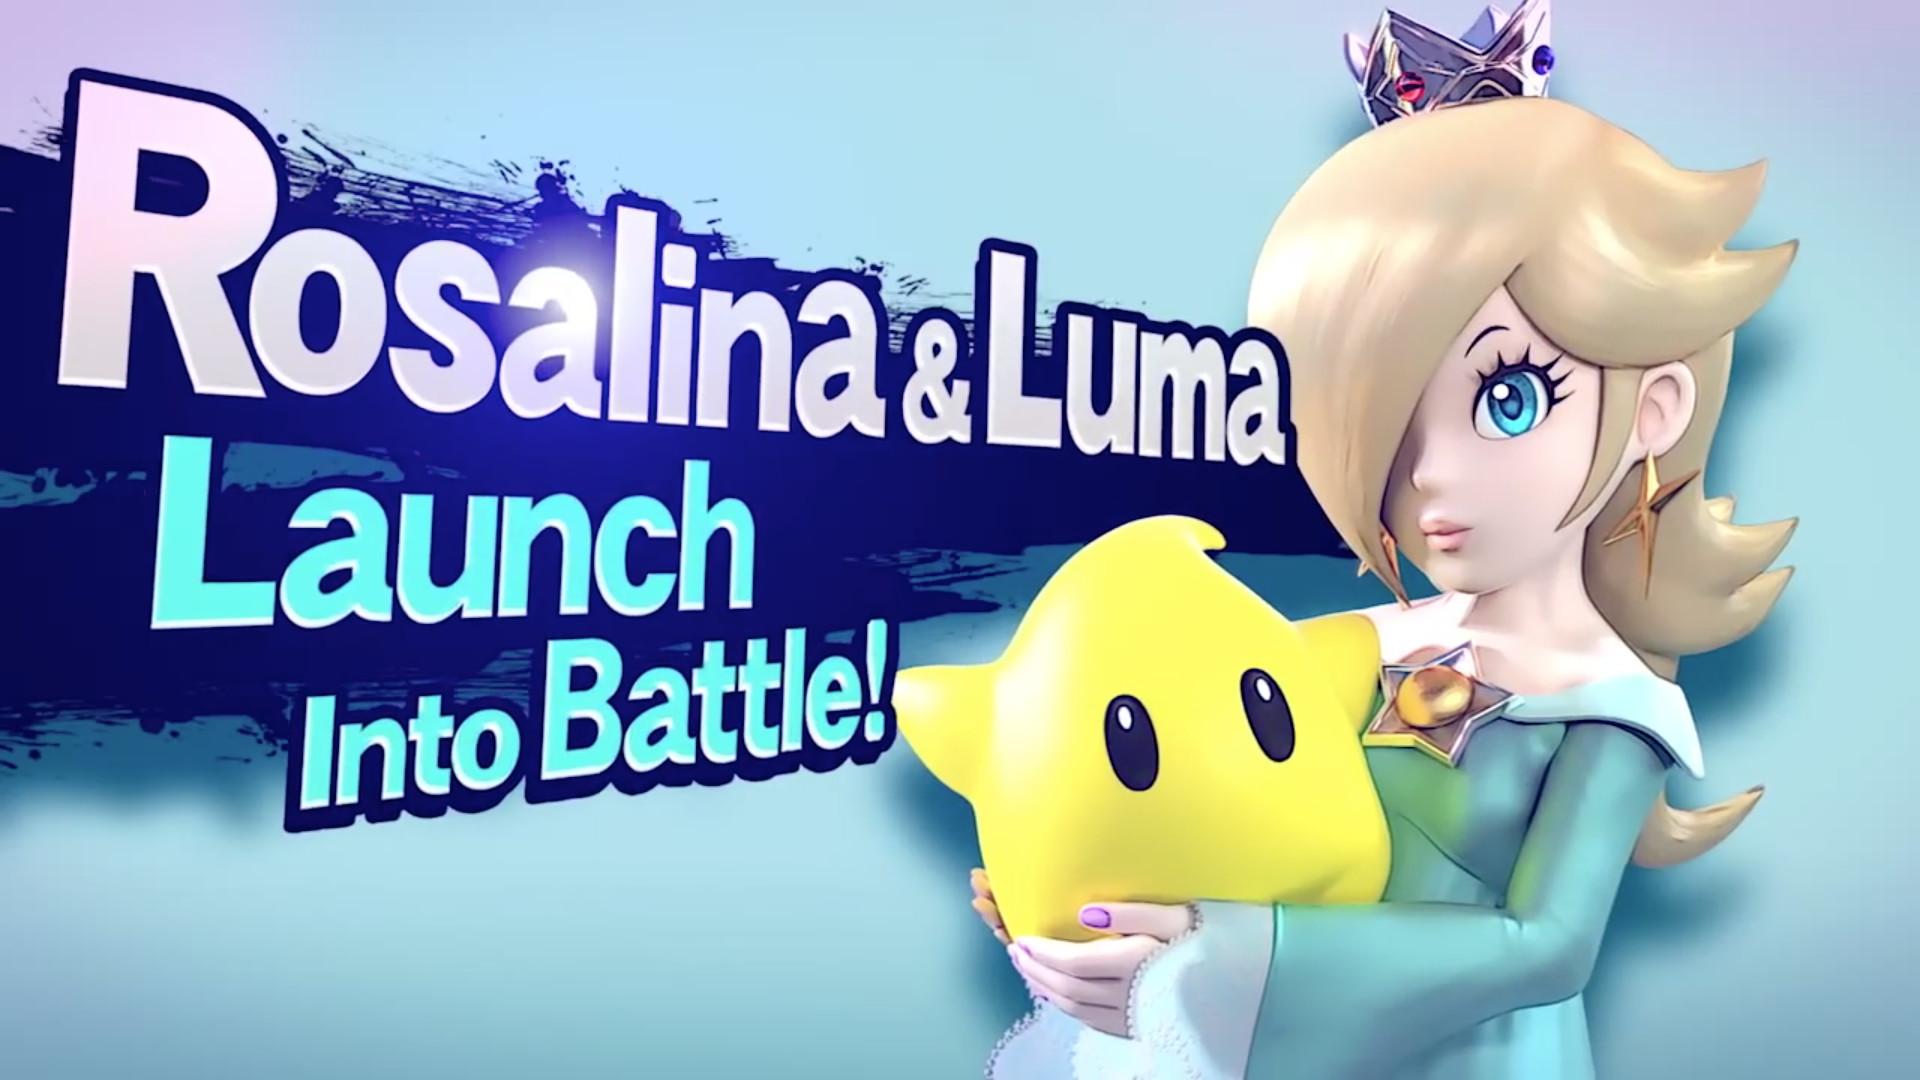 Rosalina & Luma join the battle! (Image: taken from Rosalina's Smash  trailer)